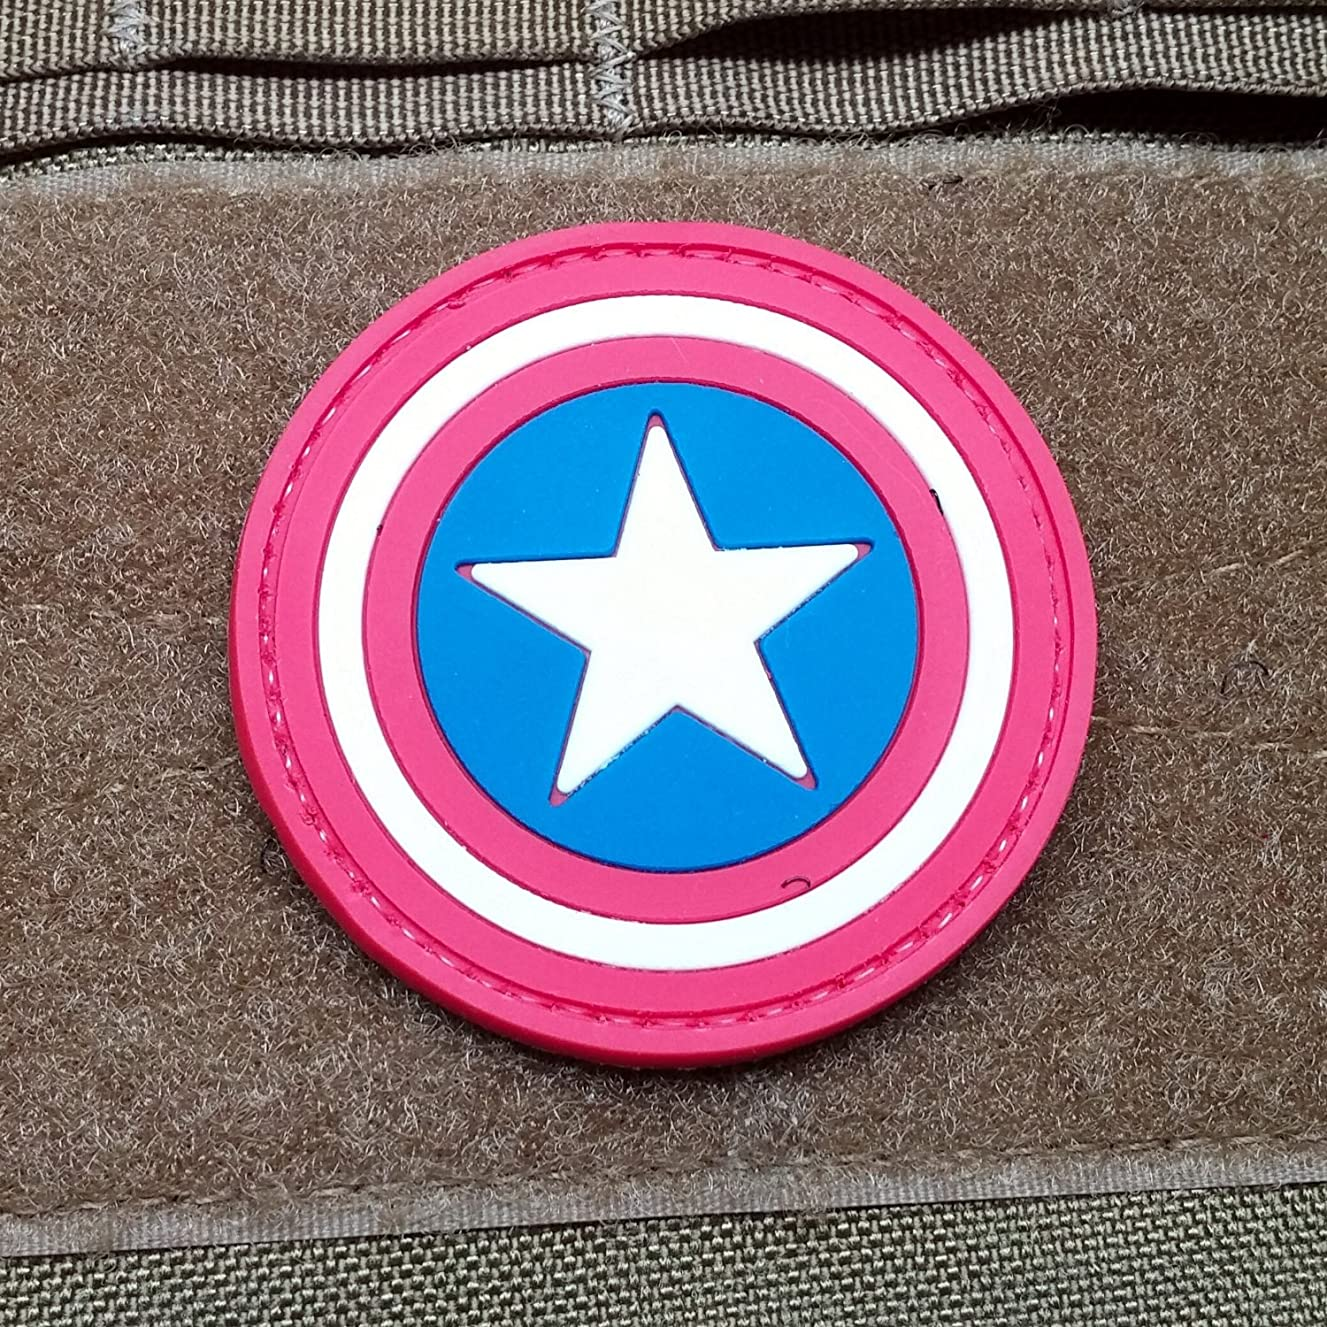 NEO Tactical Gear Captain America Morale Patch PVC